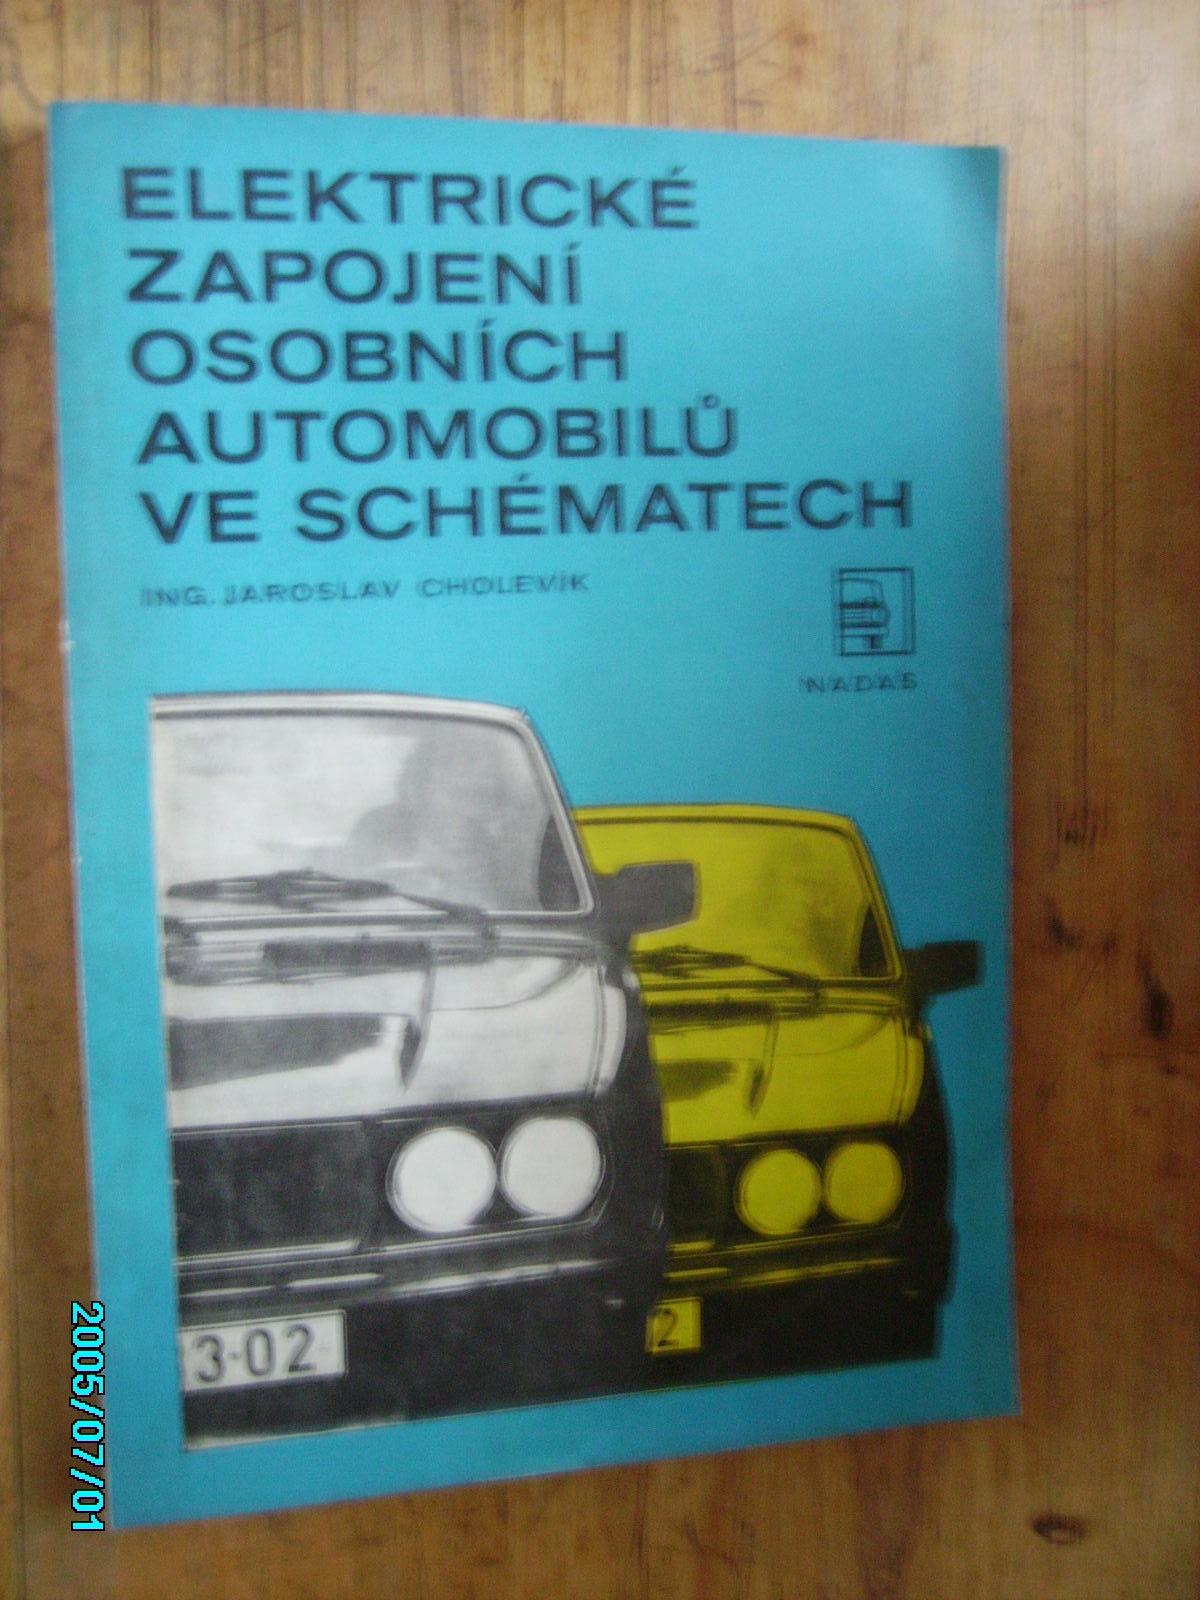 Antikvariat Ichtys On Line Prodej Knih Katalog Auto Moto